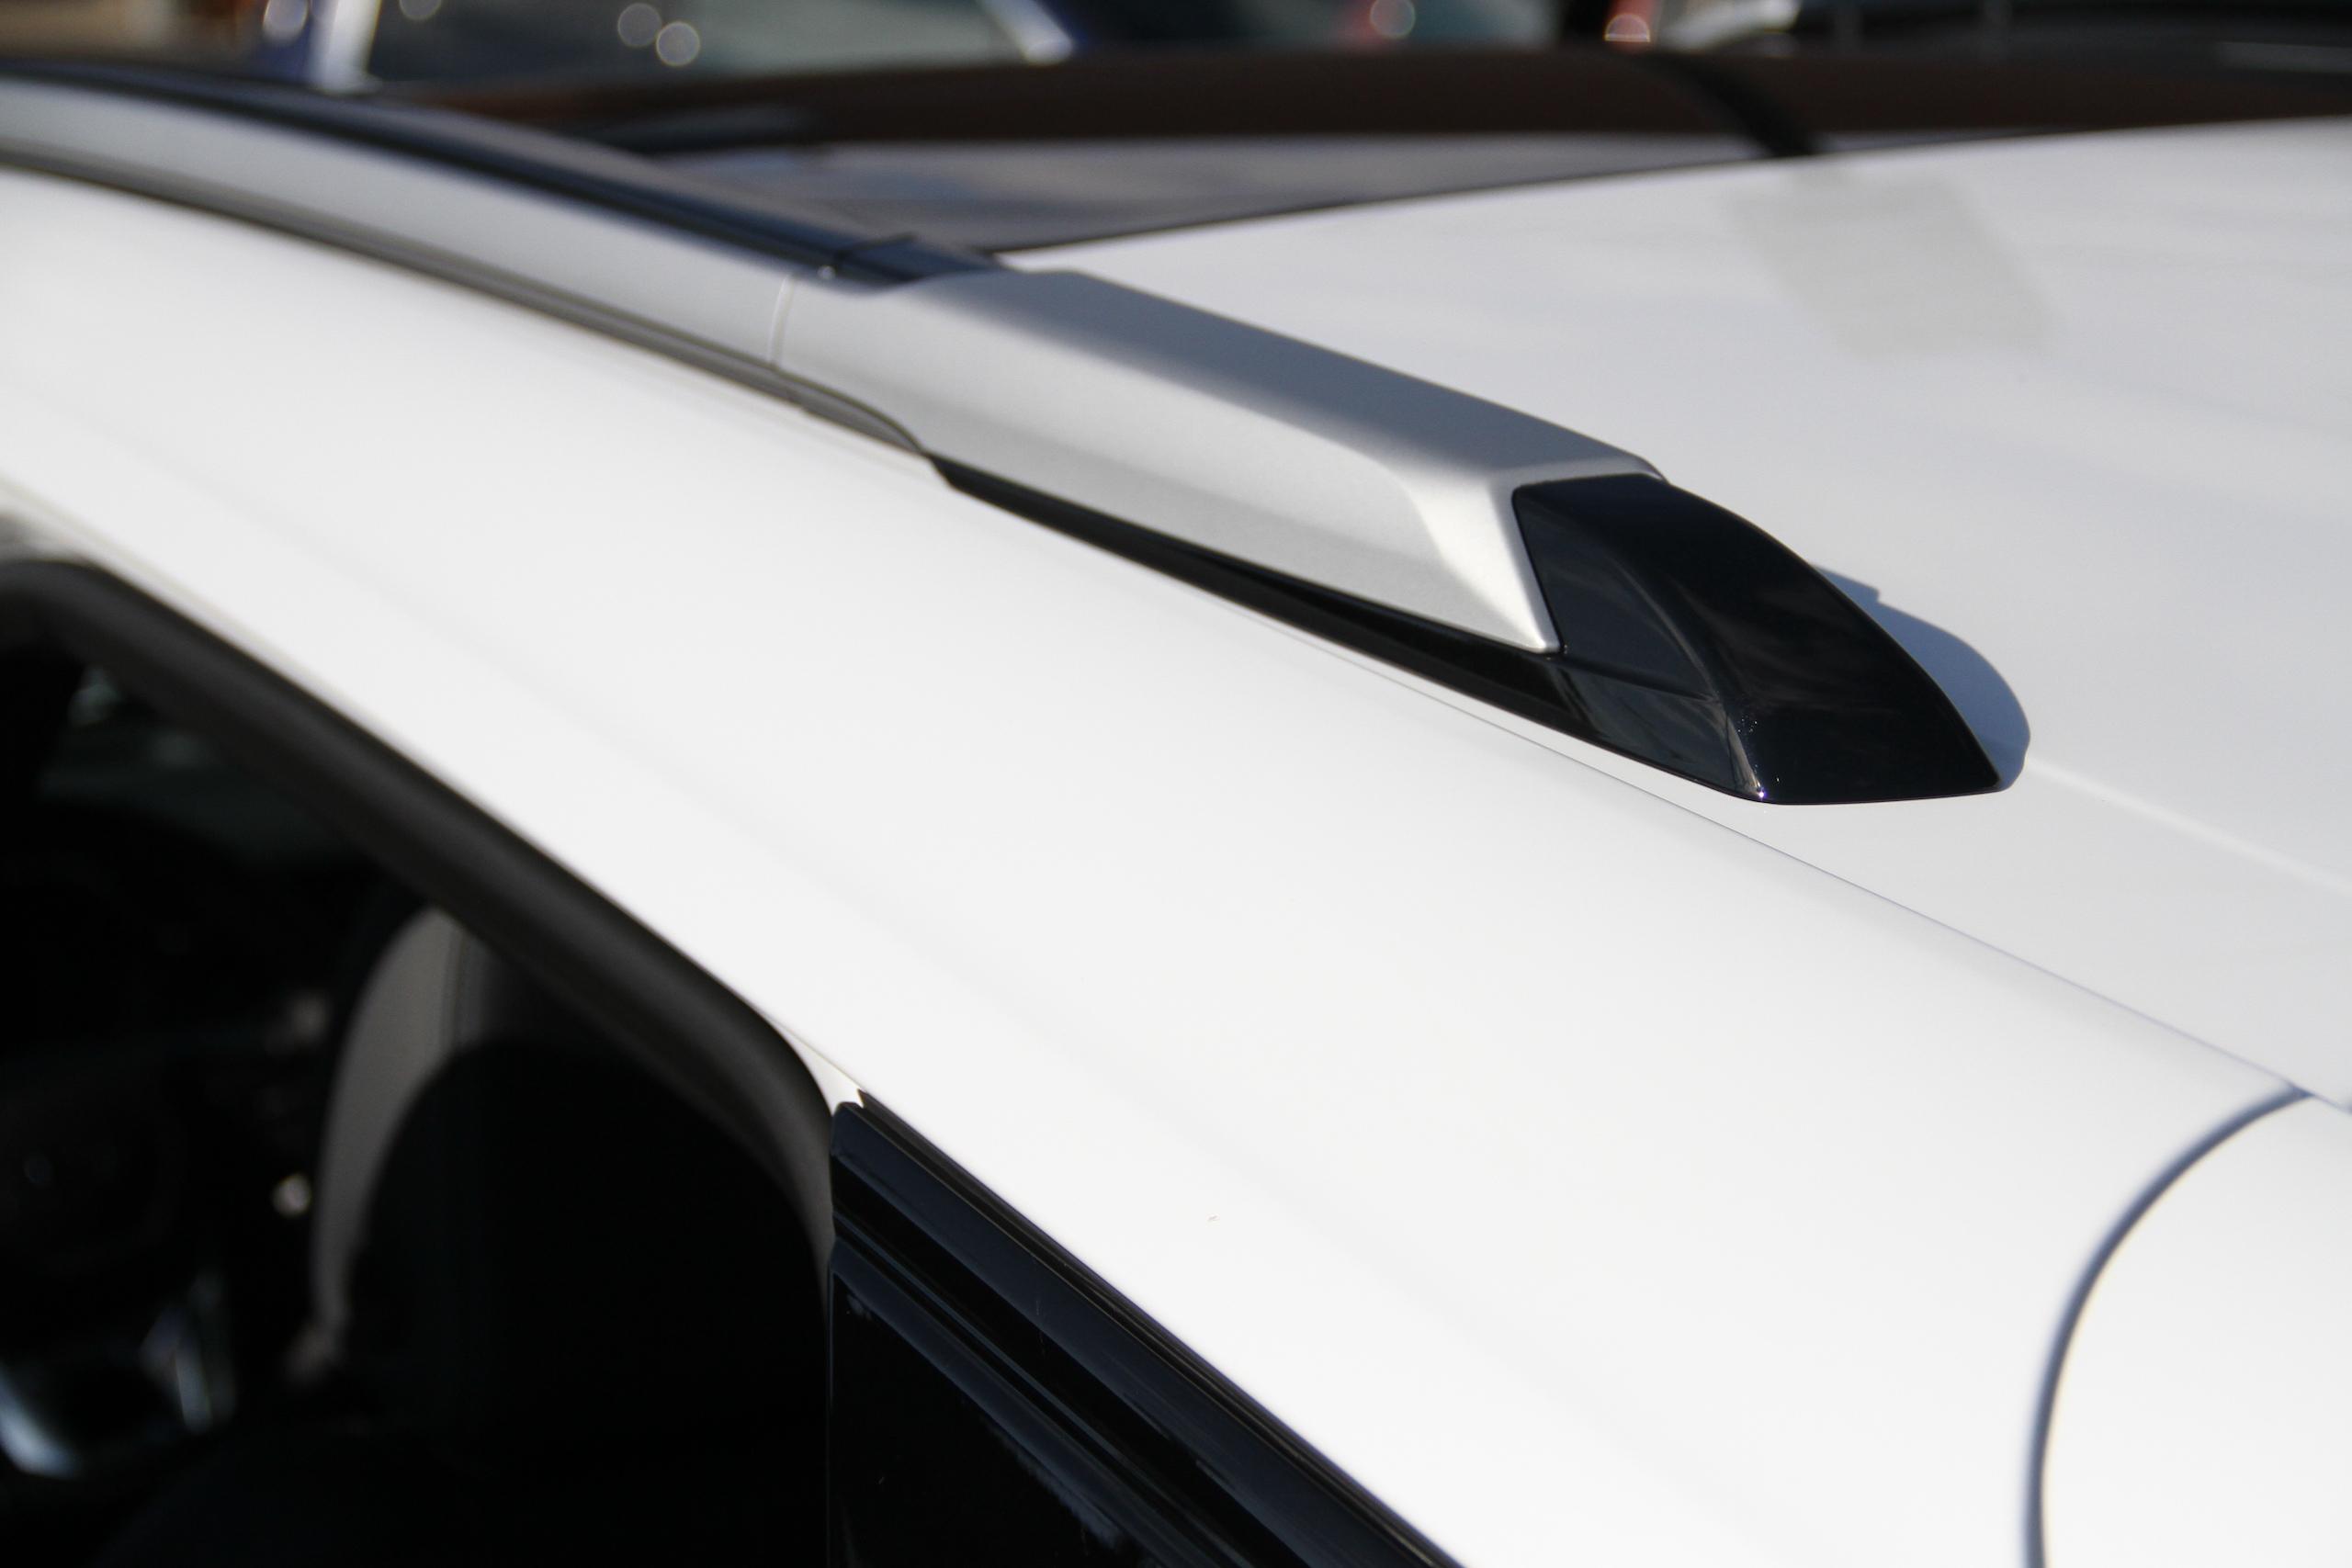 2022 Bolt EUV roof rail detail